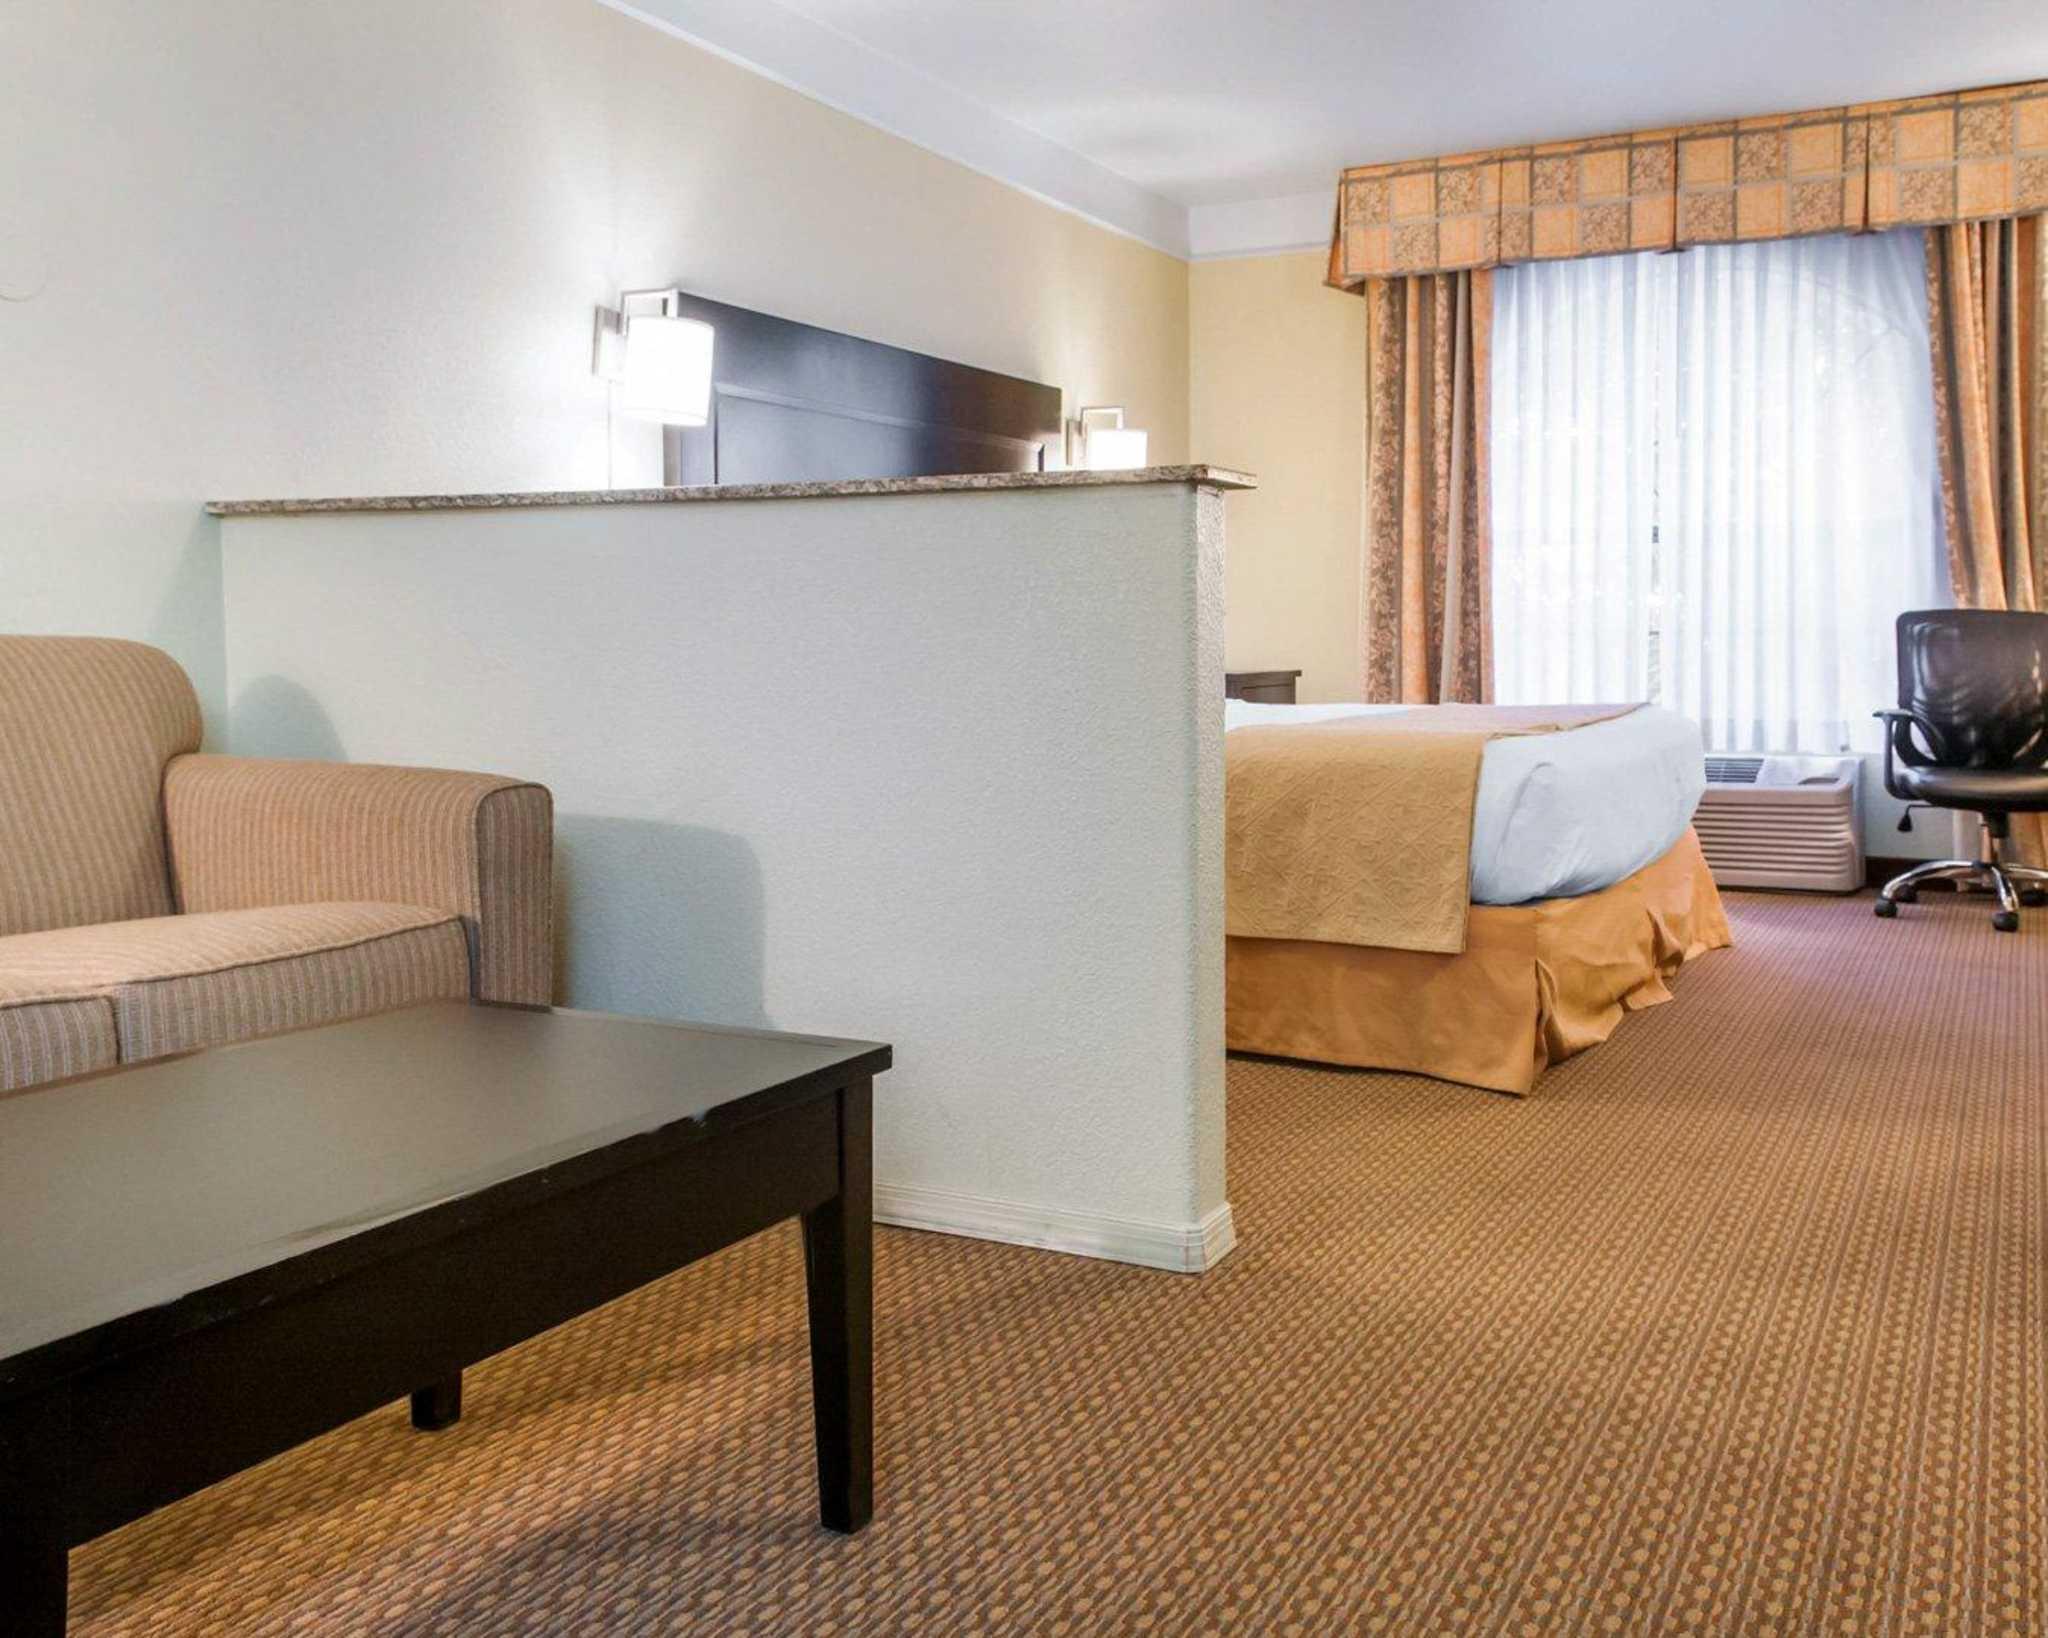 Quality Inn & Suites image 22